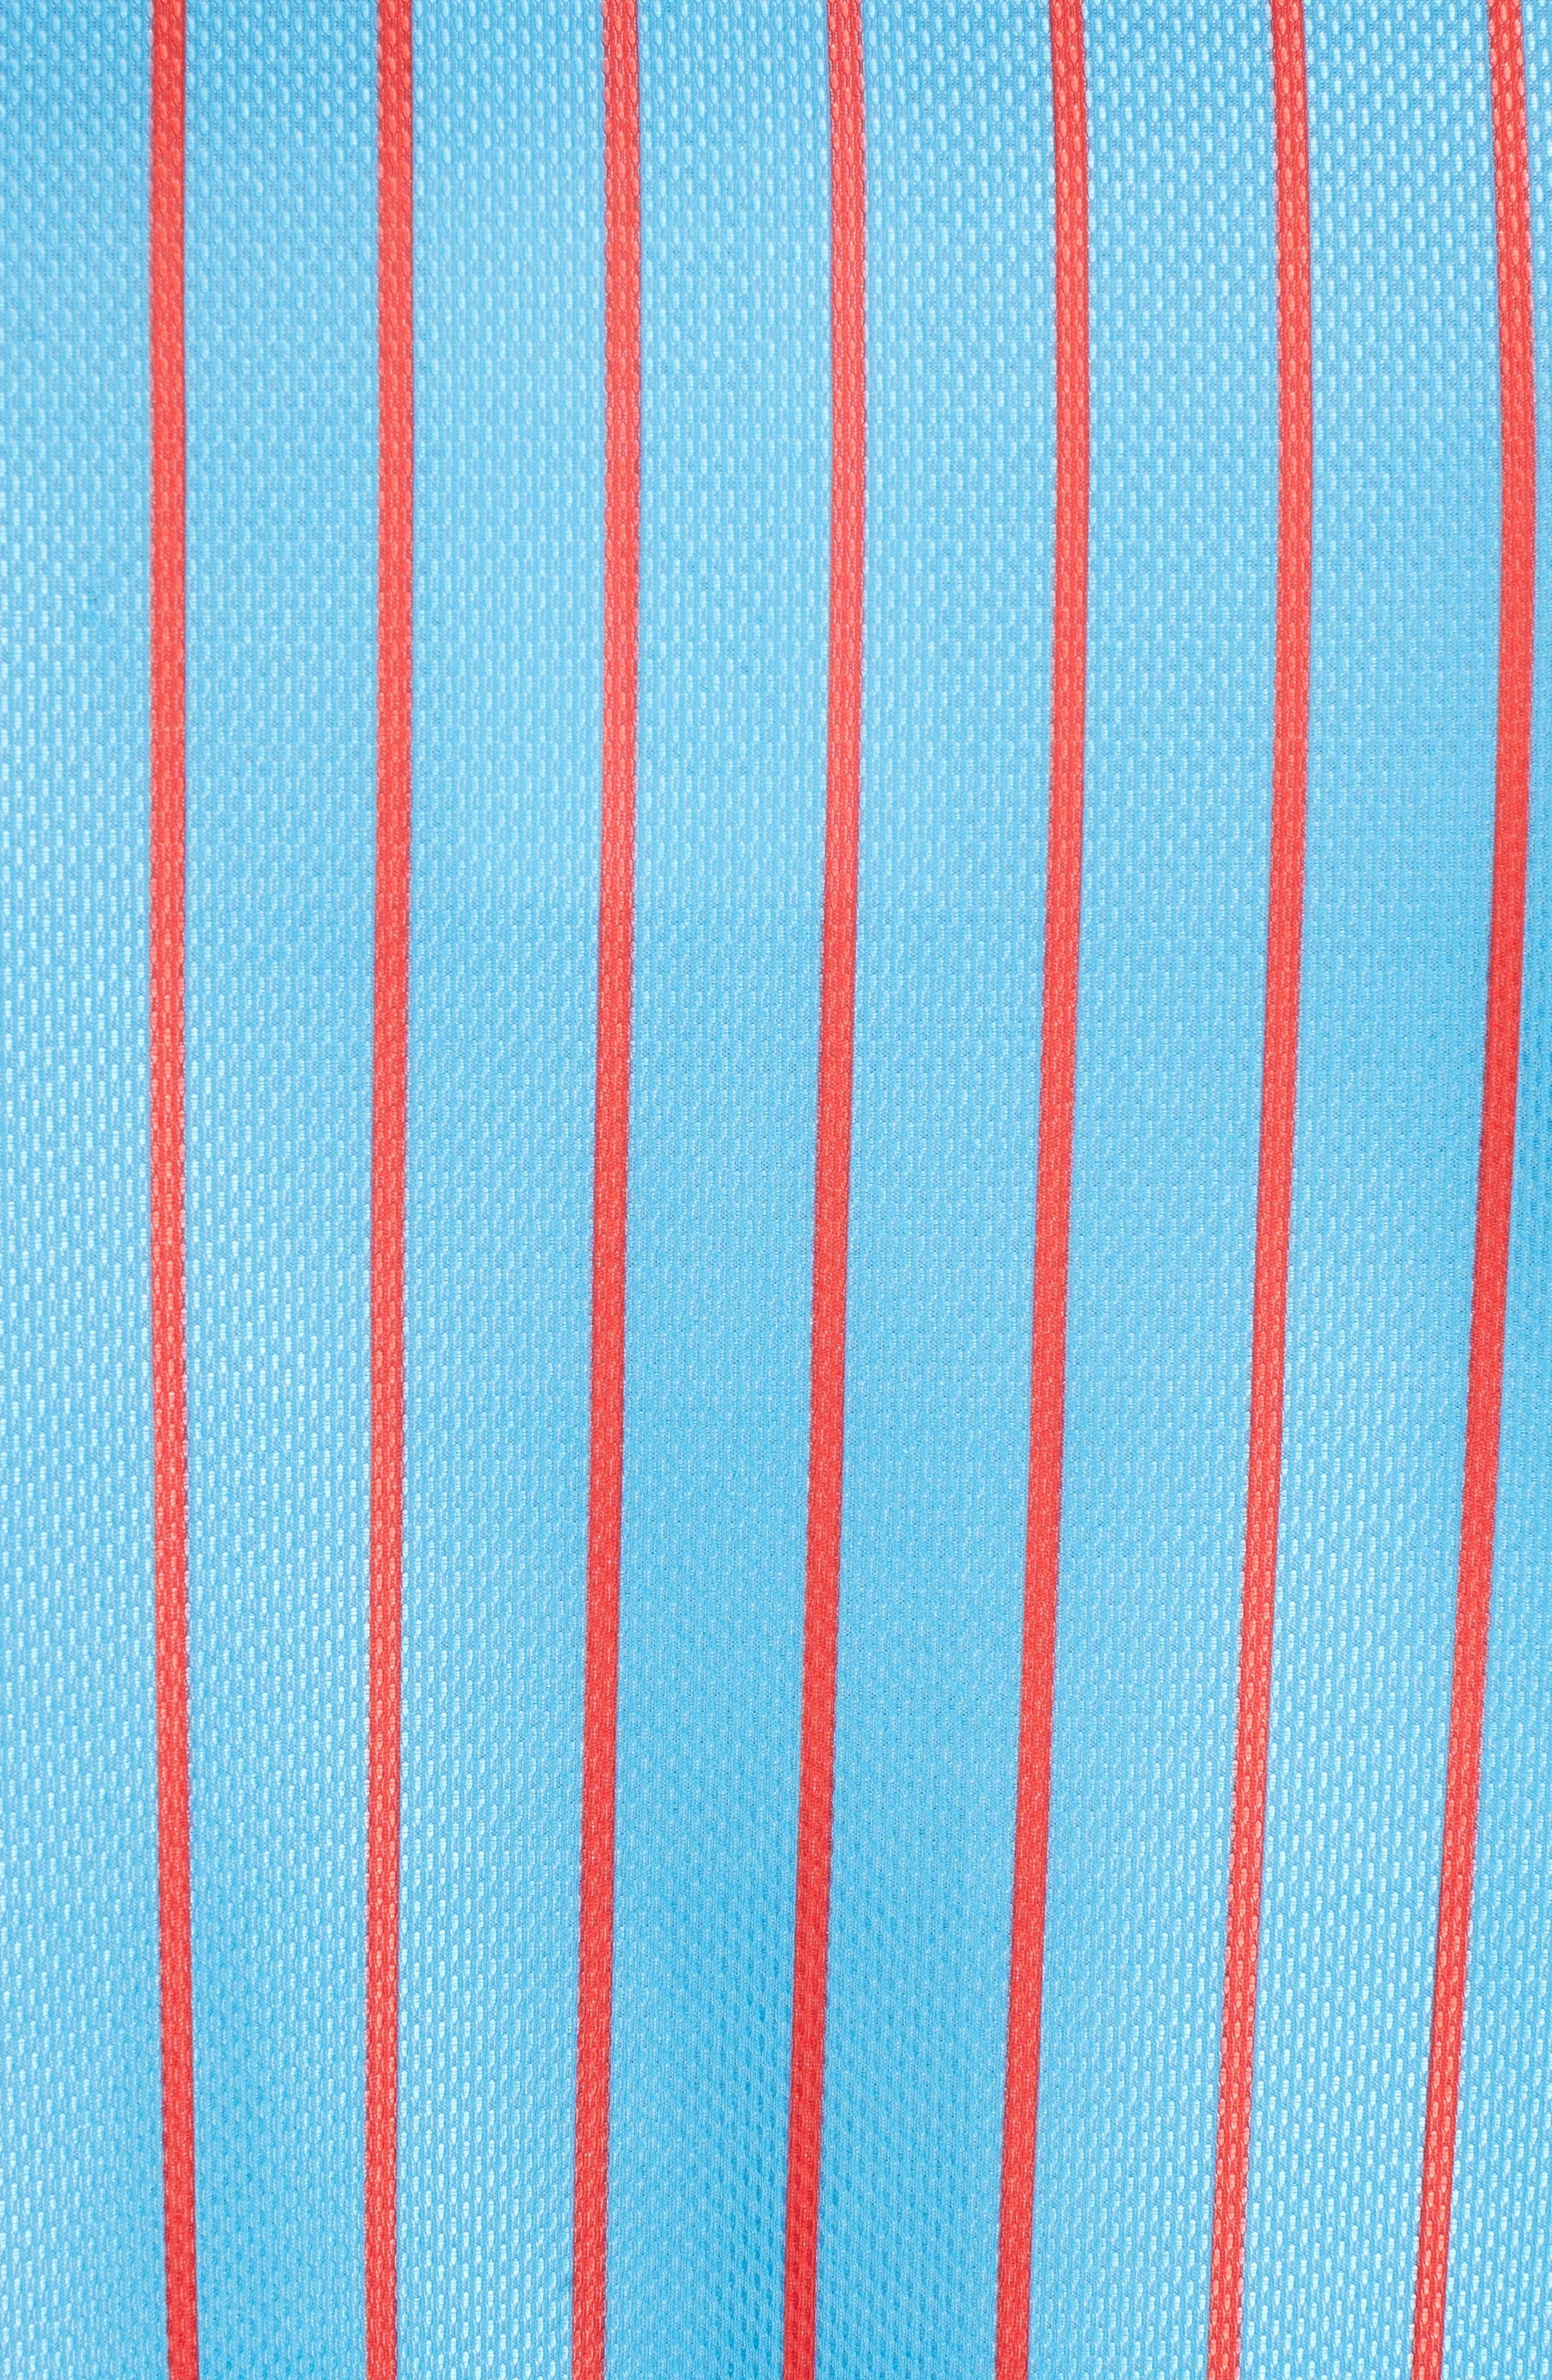 Hyper Print T-Shirt,                             Alternate thumbnail 5, color,                             441